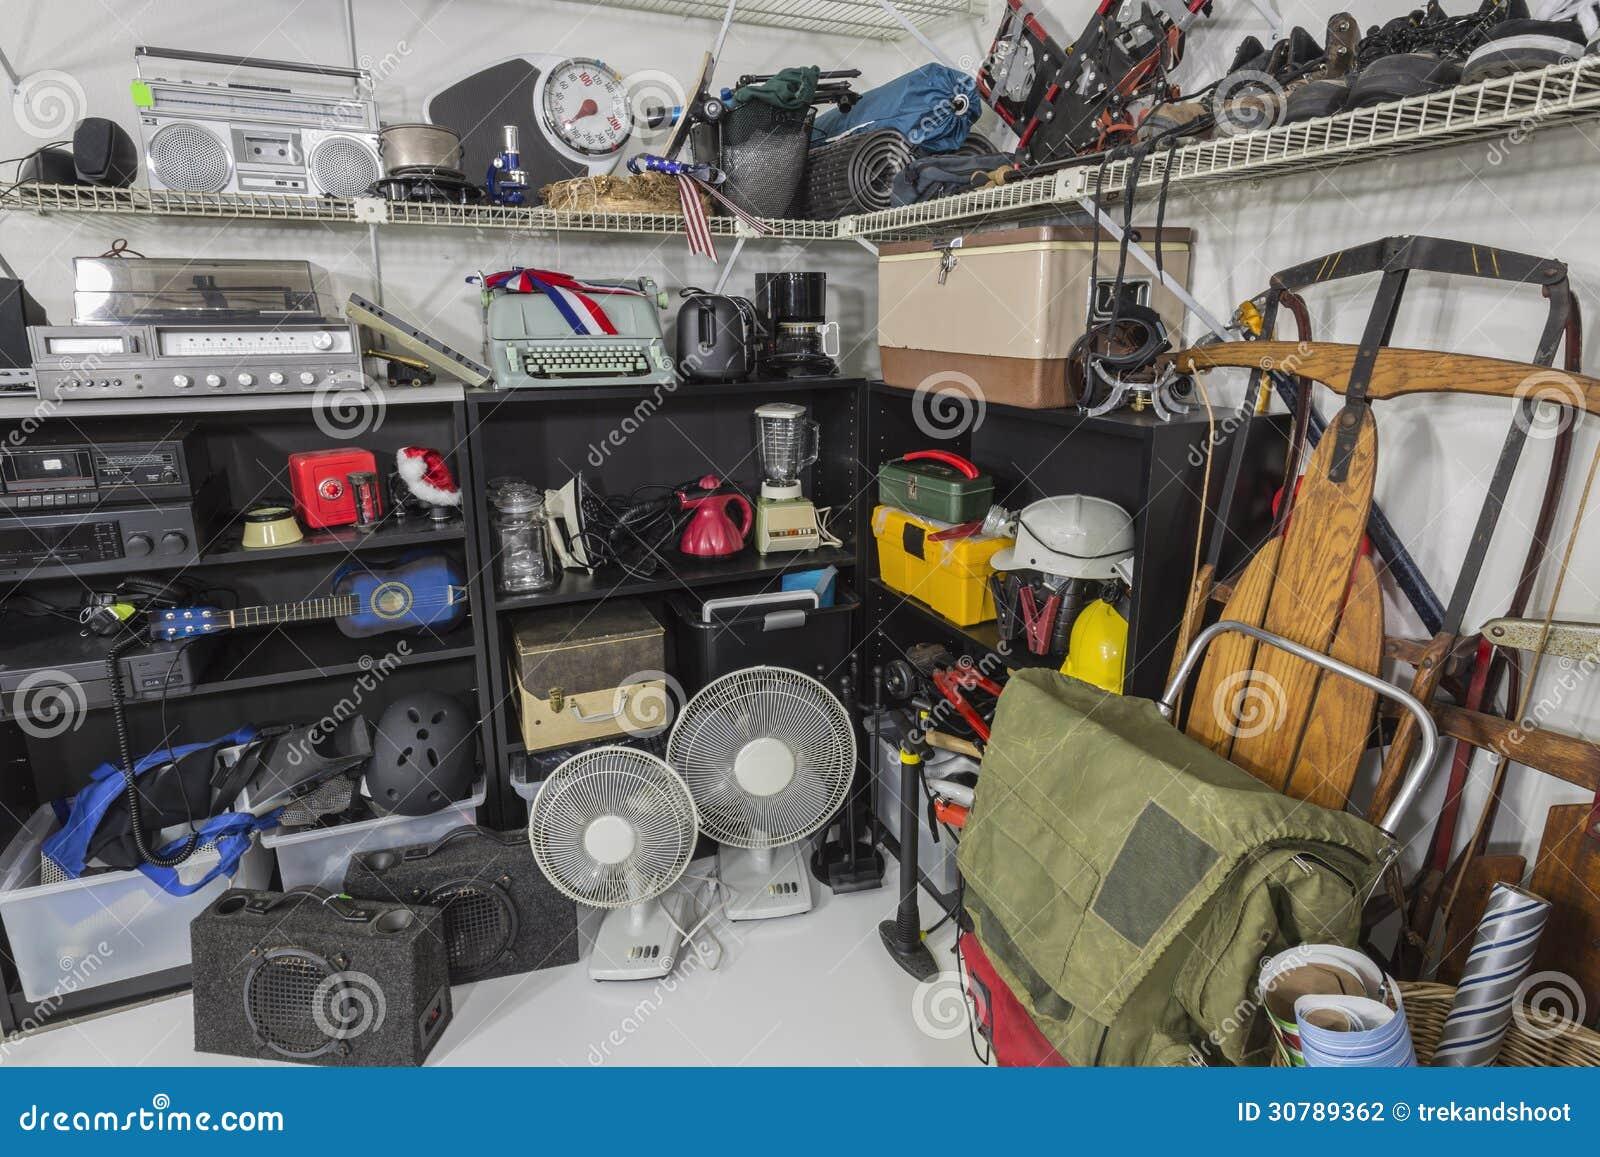 vintage garage items